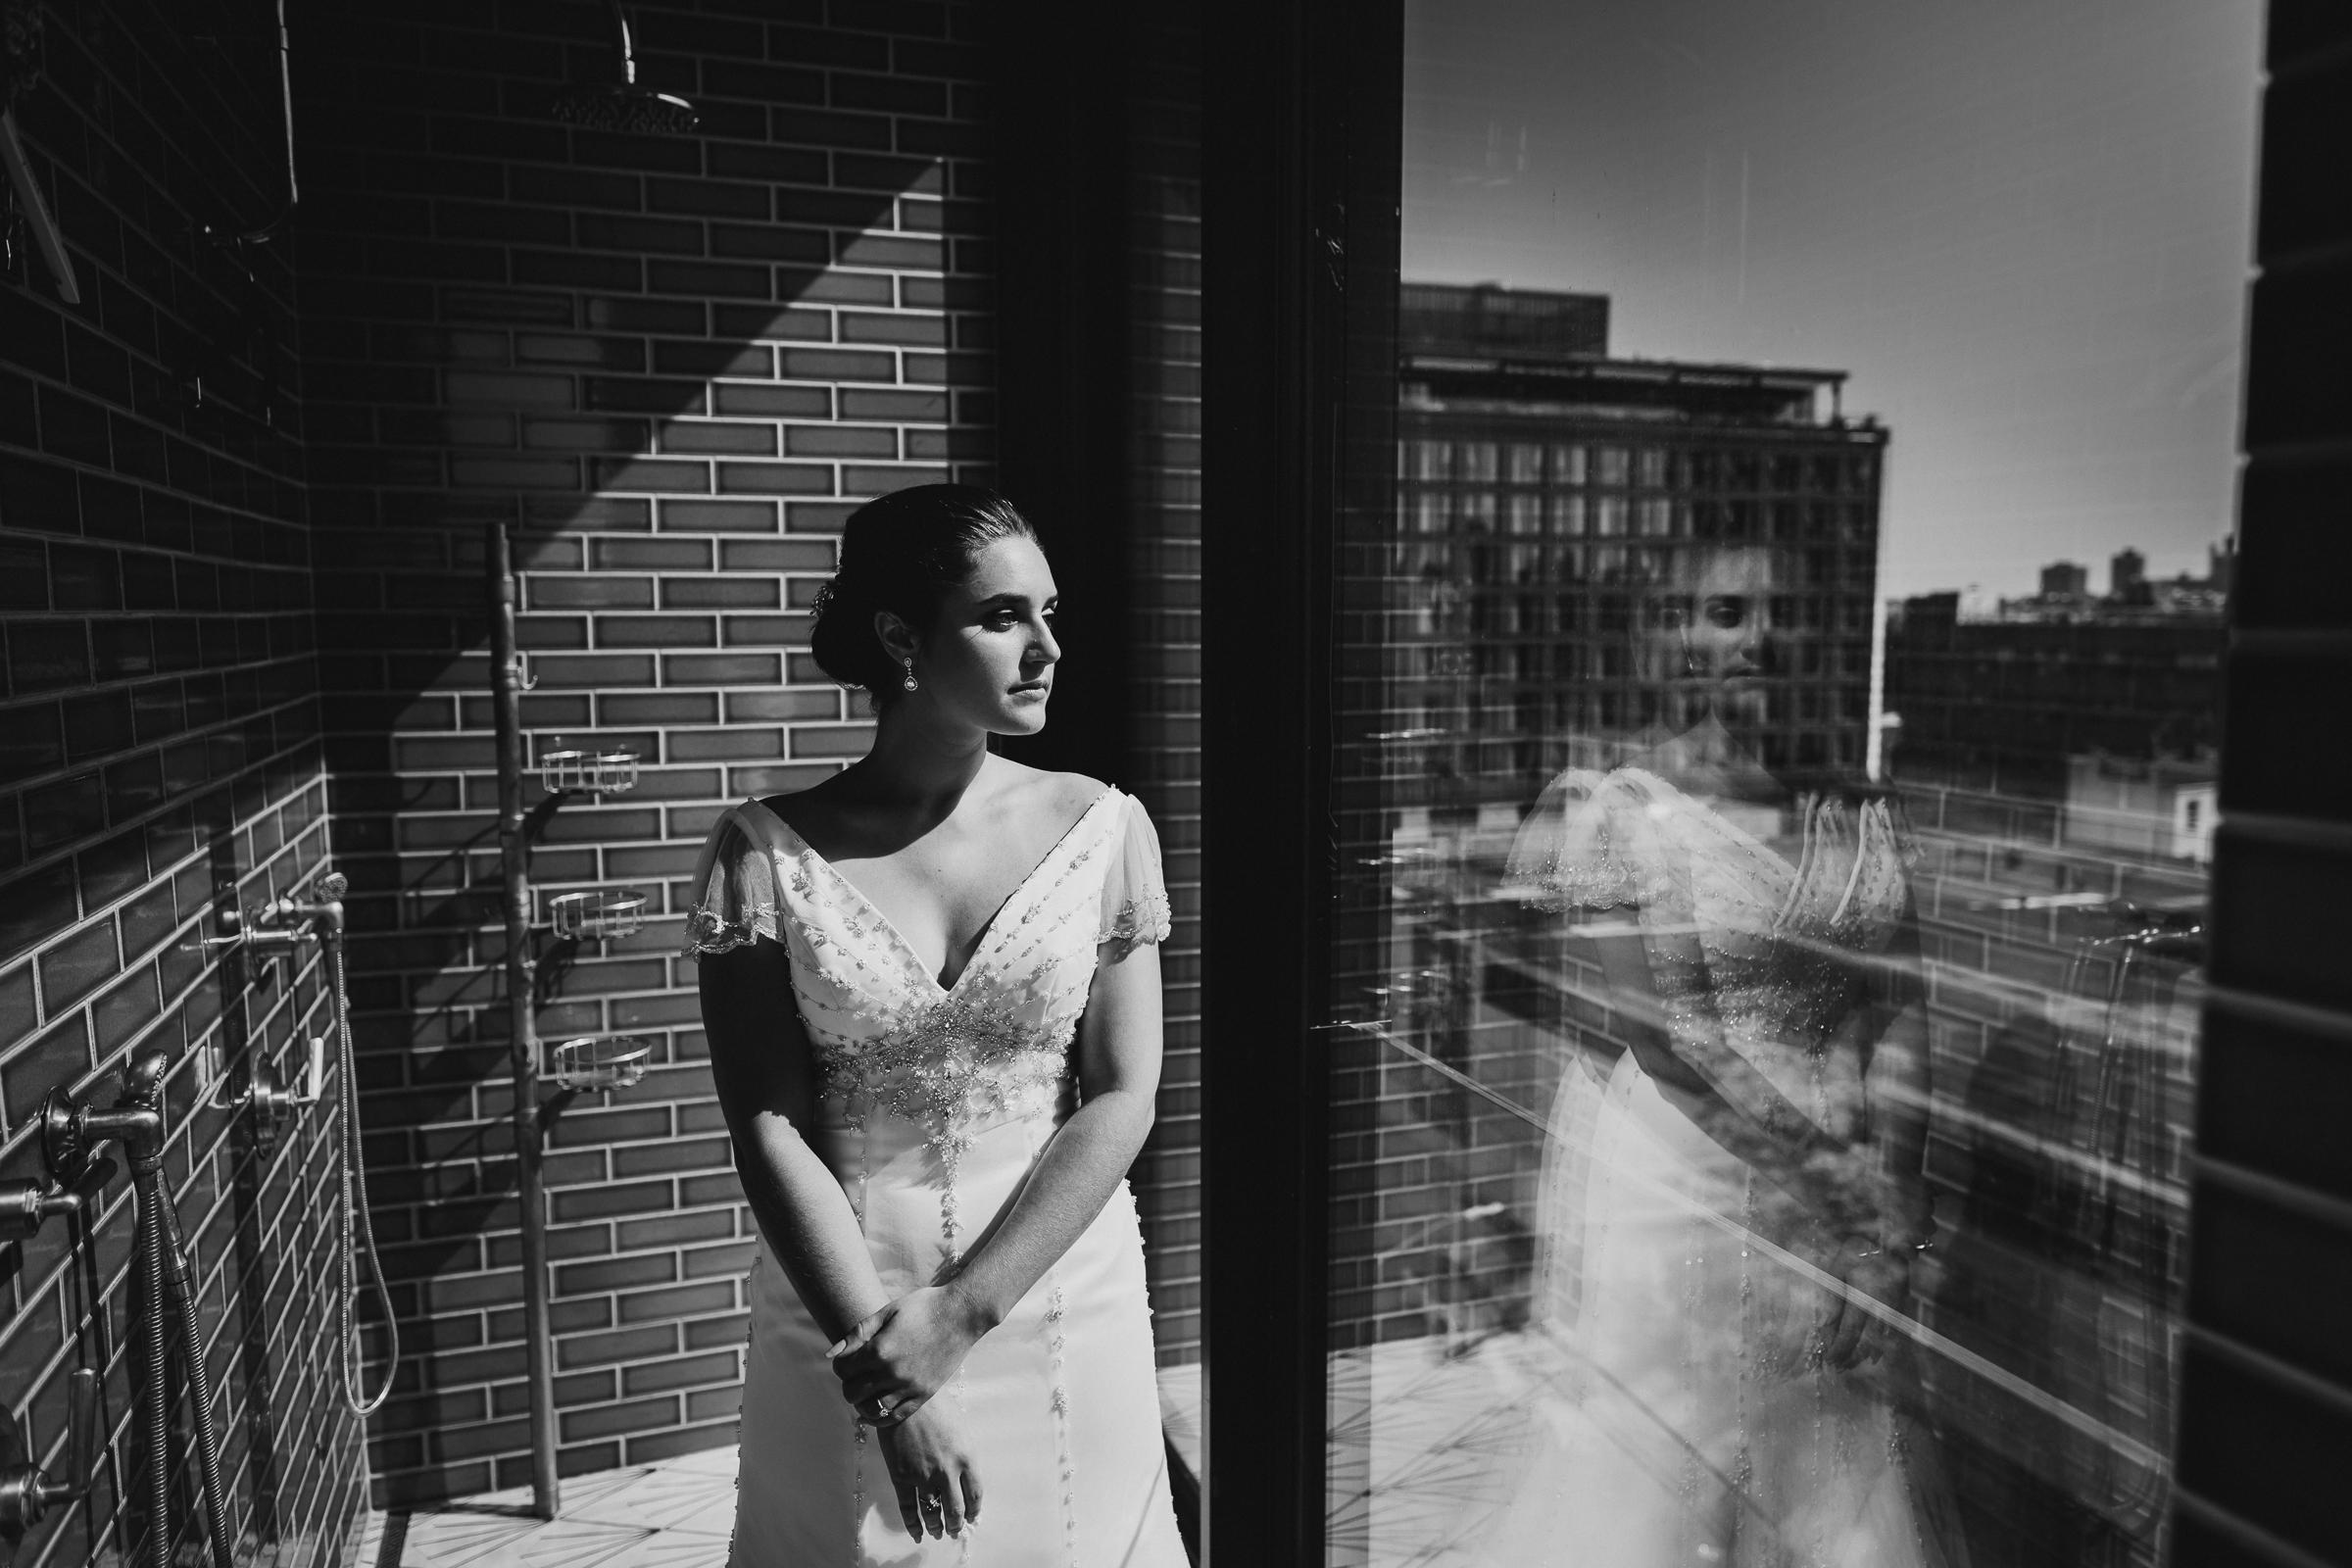 Brooklyn-Winery-NYC-Editorial-Documentary-Wedding-Photographer-Gina-Oli-18.jpg